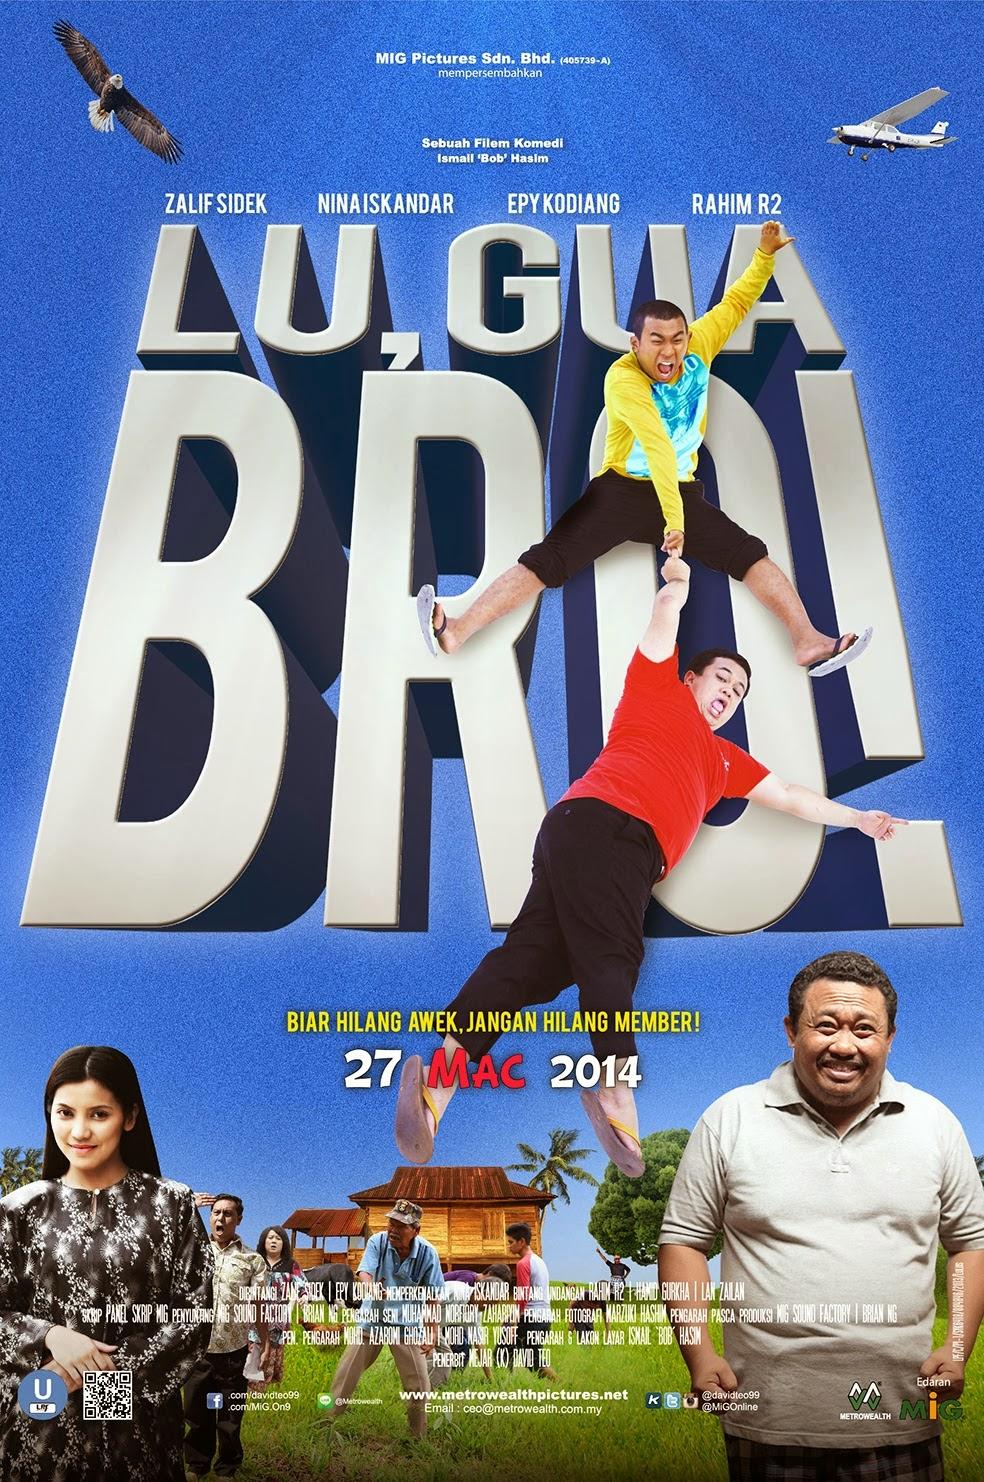 Lu, Gua Bro! | Sinopsis Dan Review Filem